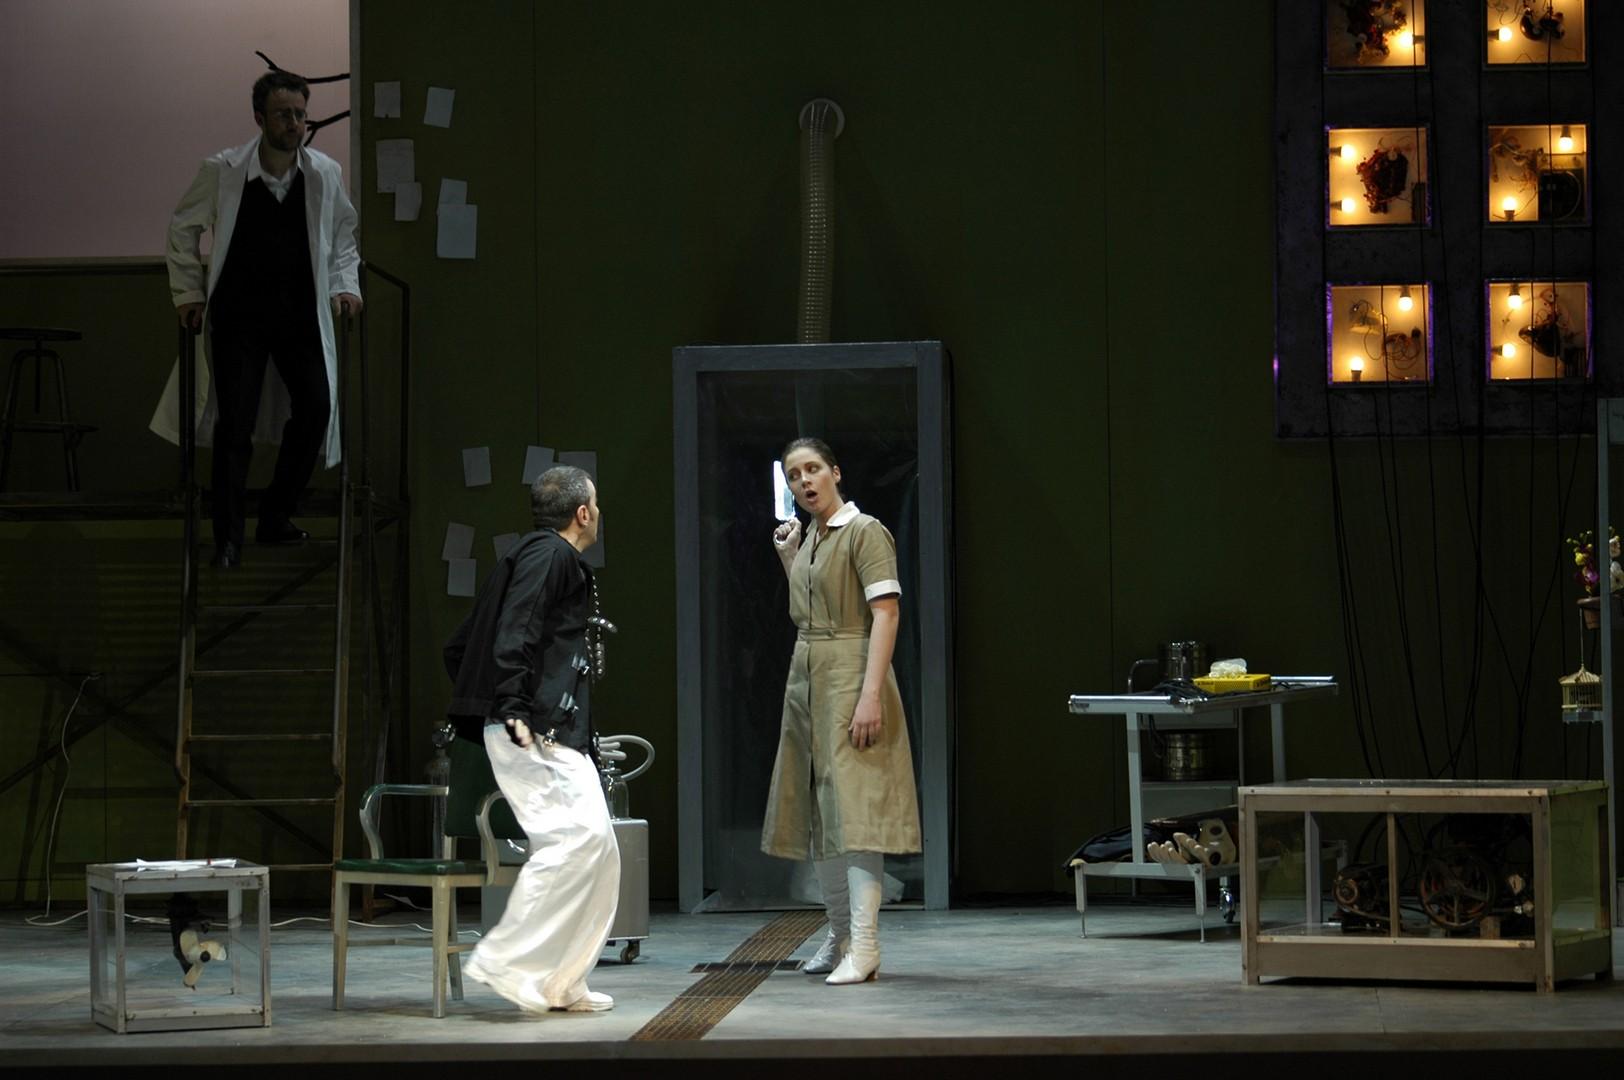 Serva-Padrona-Opera-directed-by-Jacopo-Spirei-4